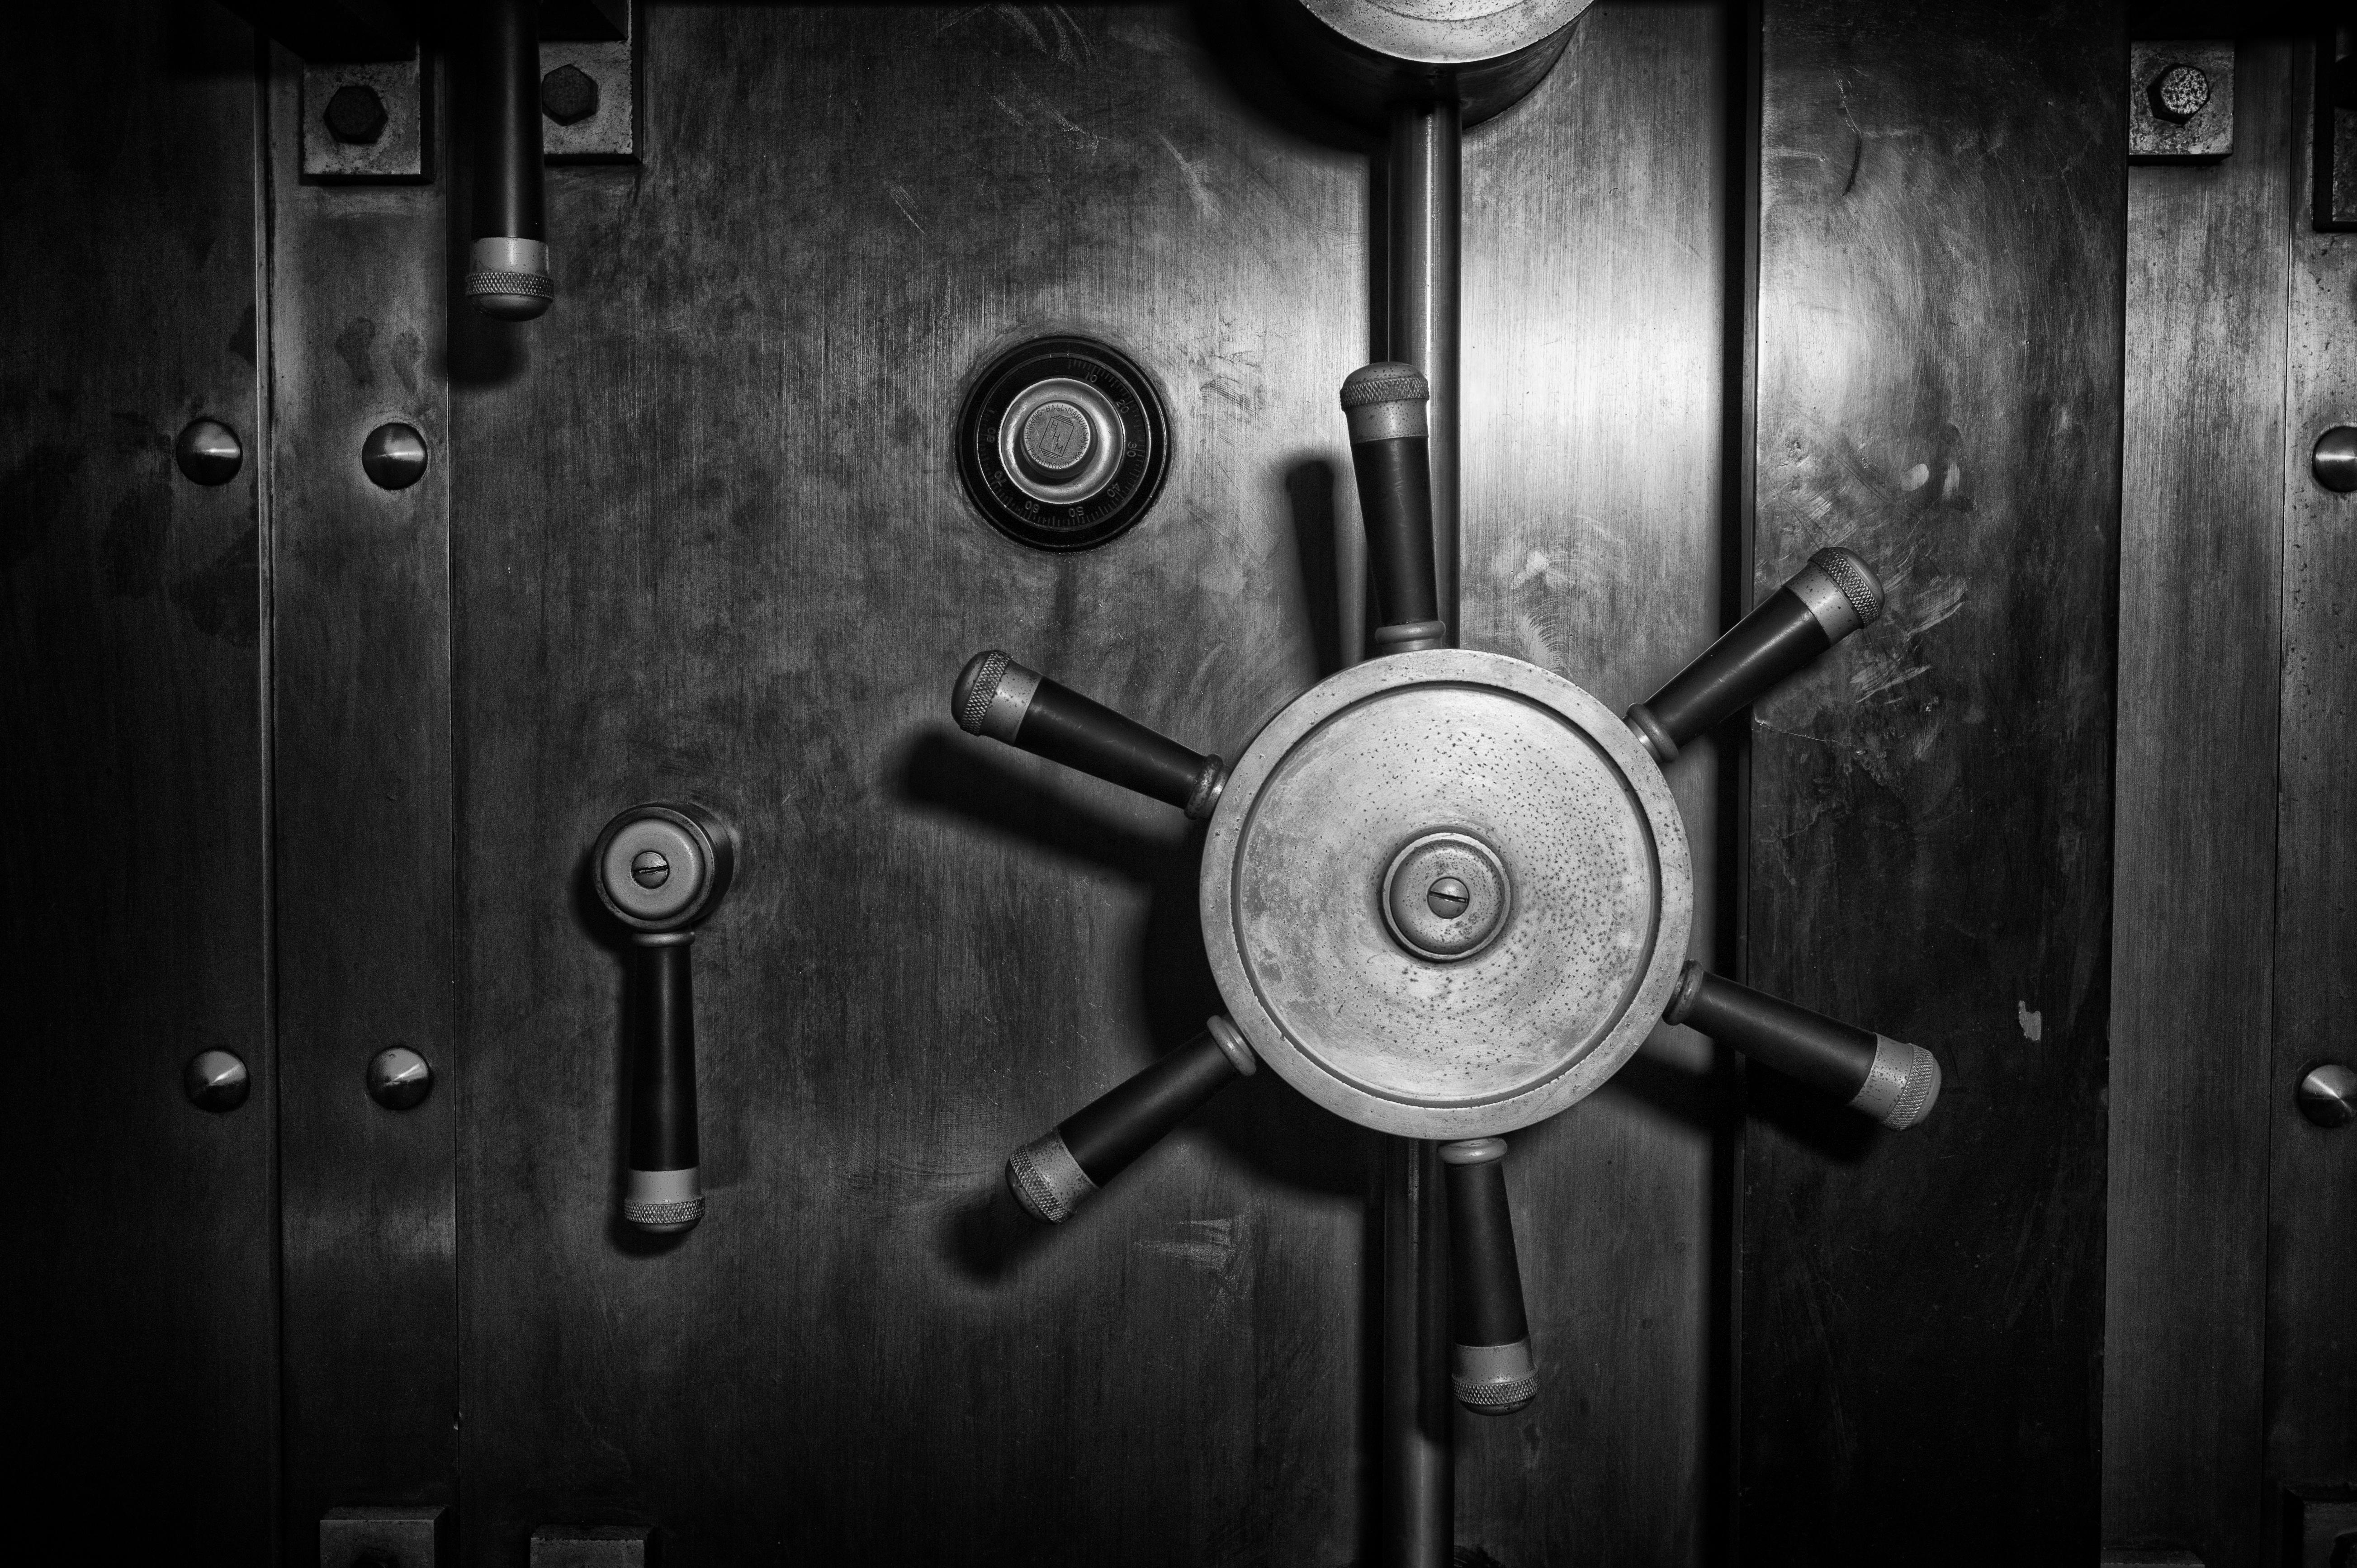 Financial Services Data Breaches: More Pain Ahead?